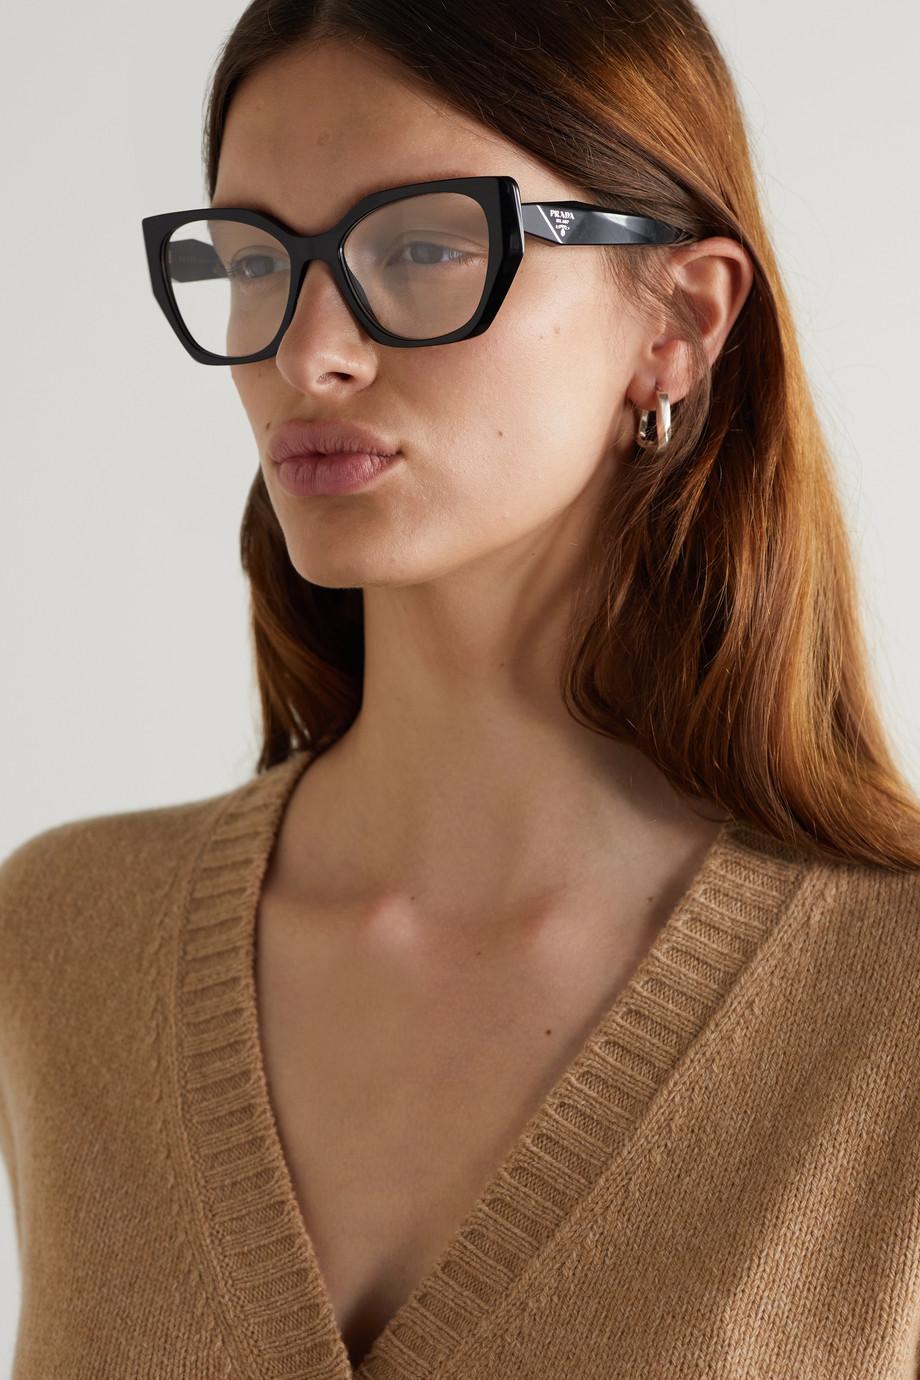 Prada Eyewear Lunettes de vue œil-de-chat en acétate